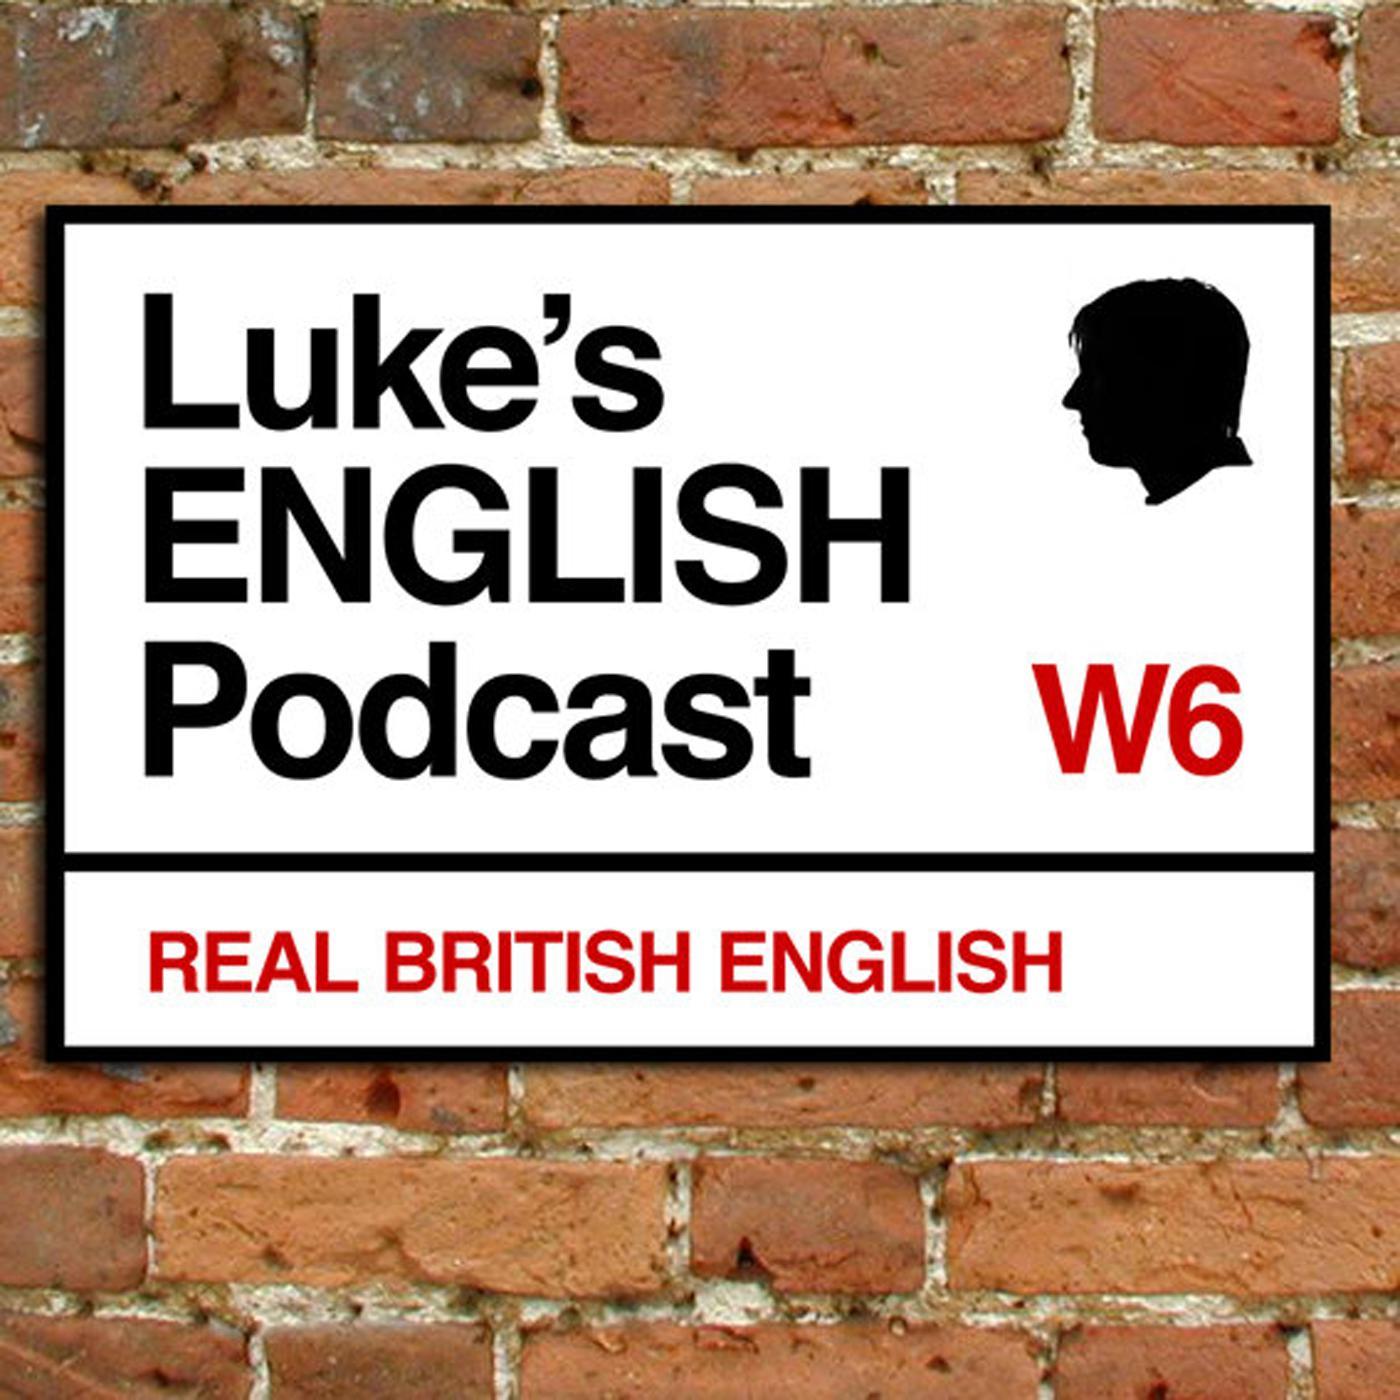 Best Episodes of Luke's ENGLISH Podcast - Learn British